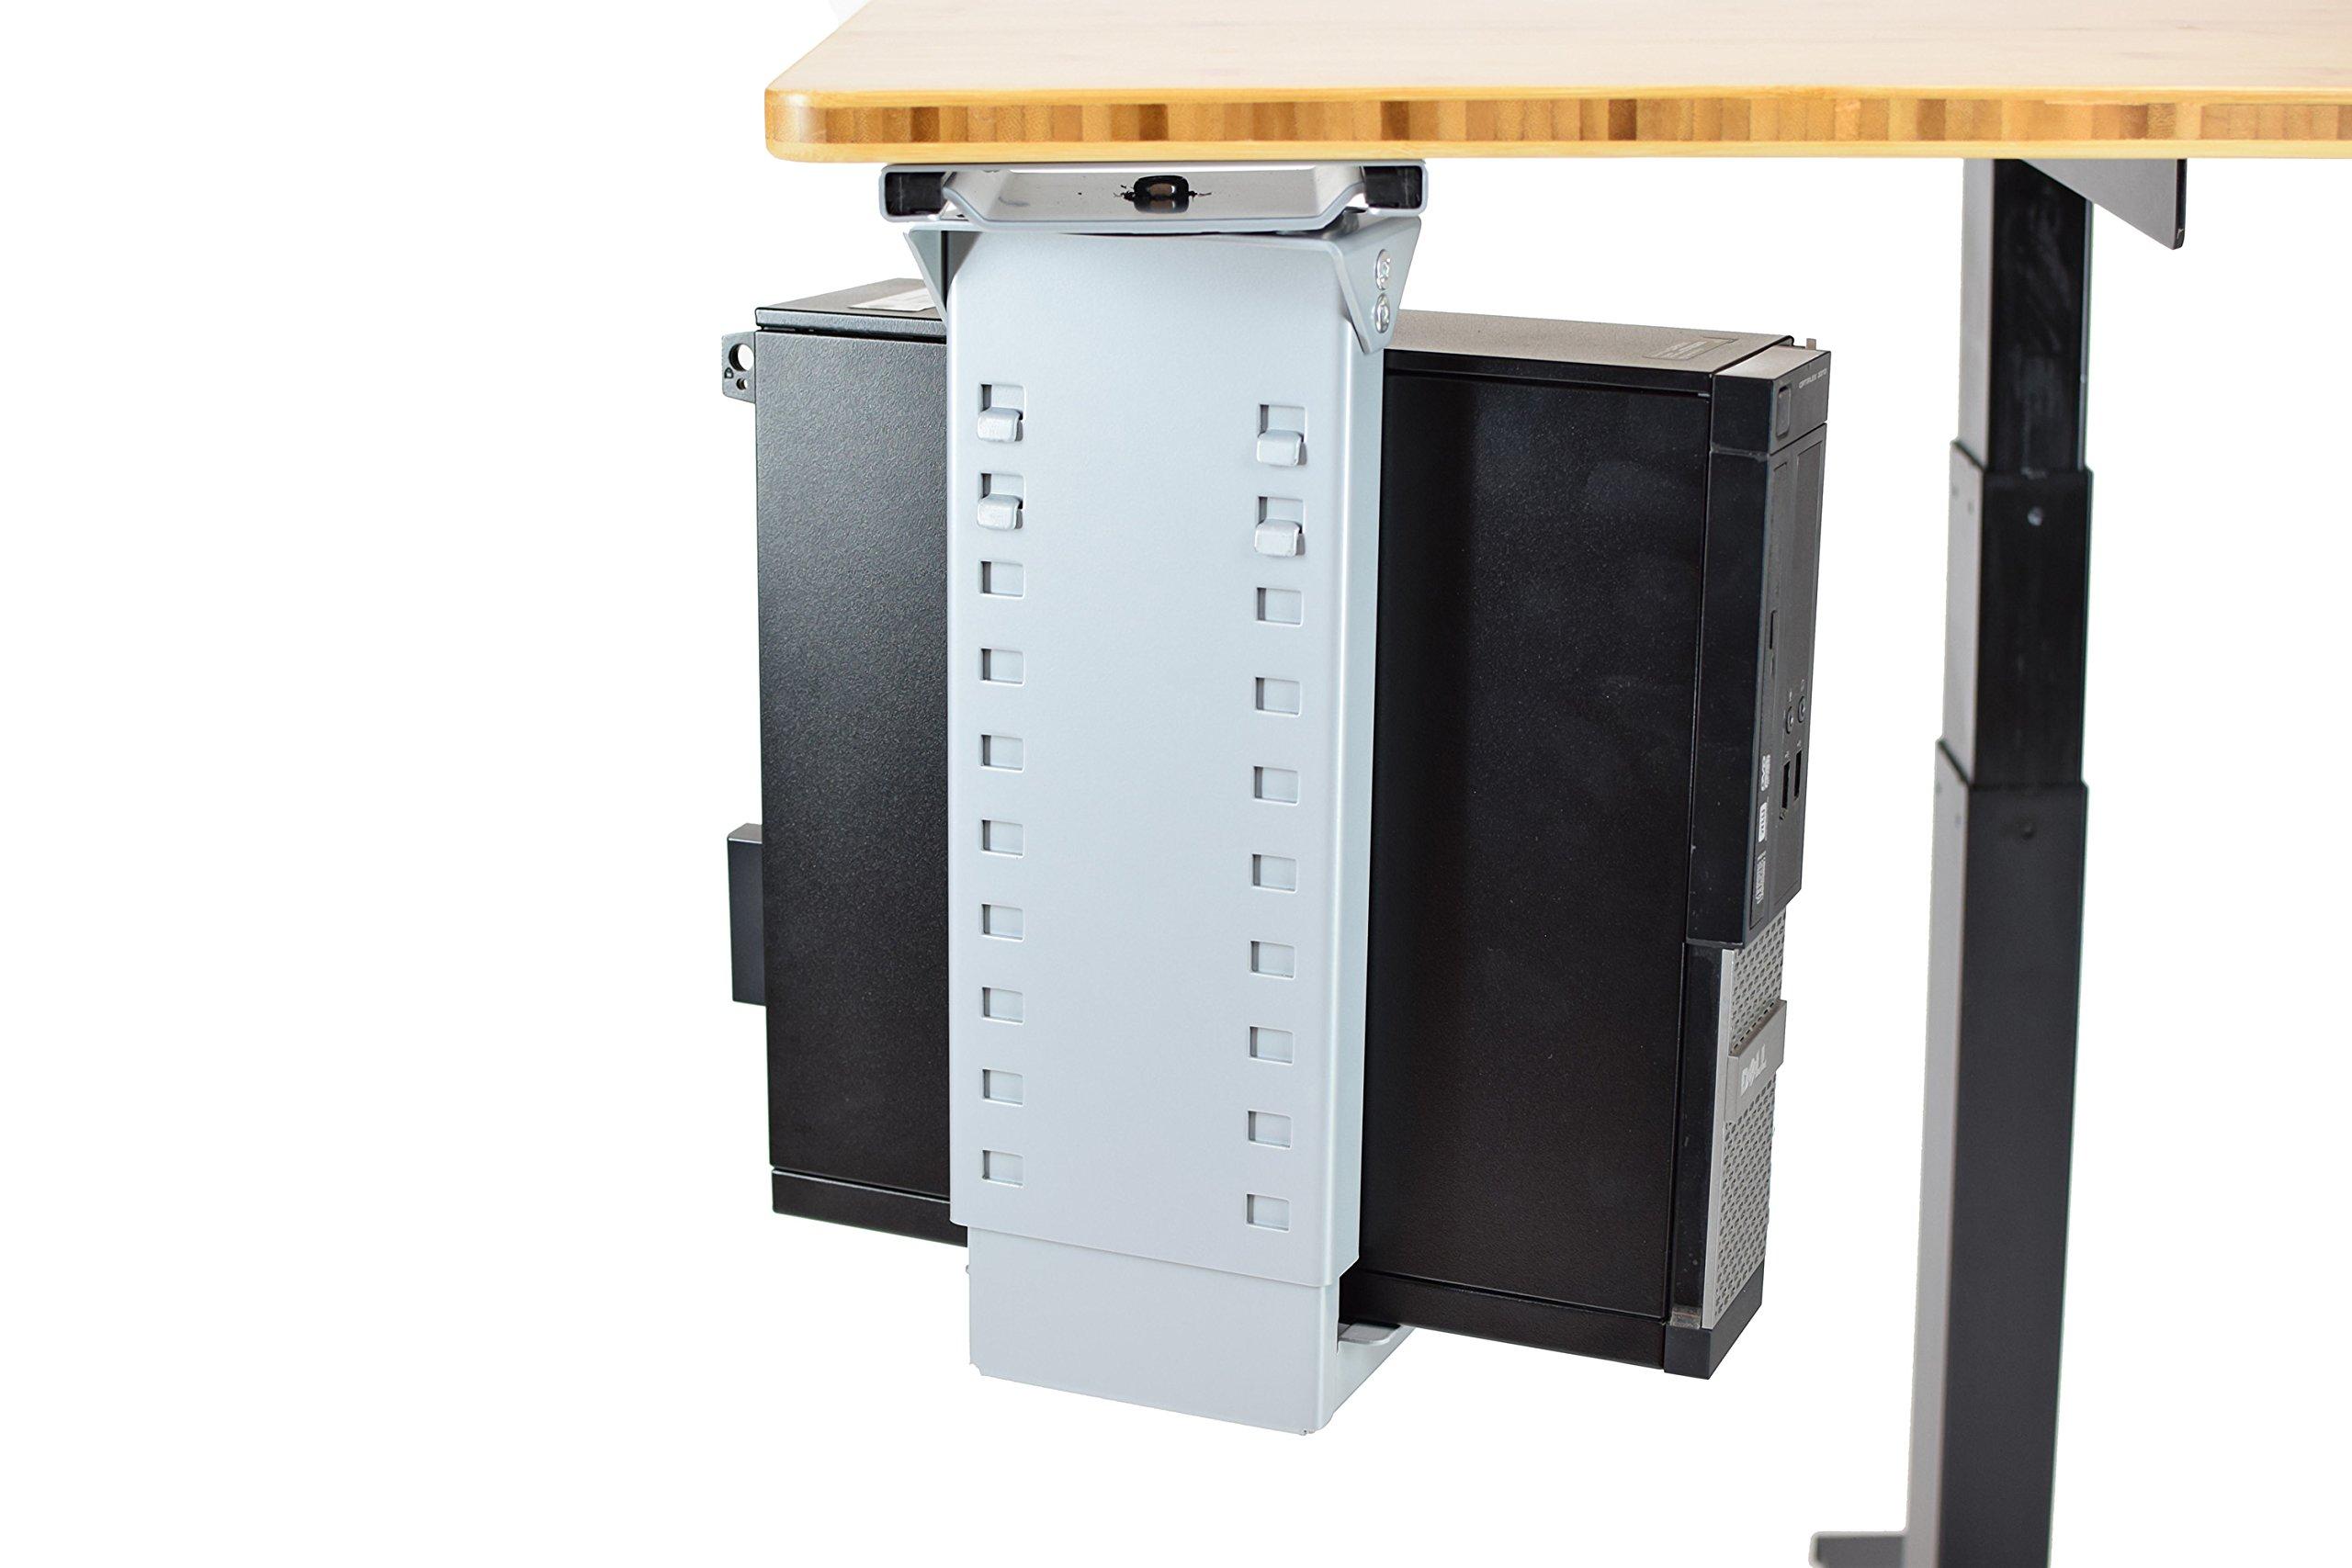 Adjustable Swivel Under-Desk CPU Holder/Under Desk PC Tower Stand/for ergonomic standing desks, stand up desks, office desks accessories (gray)